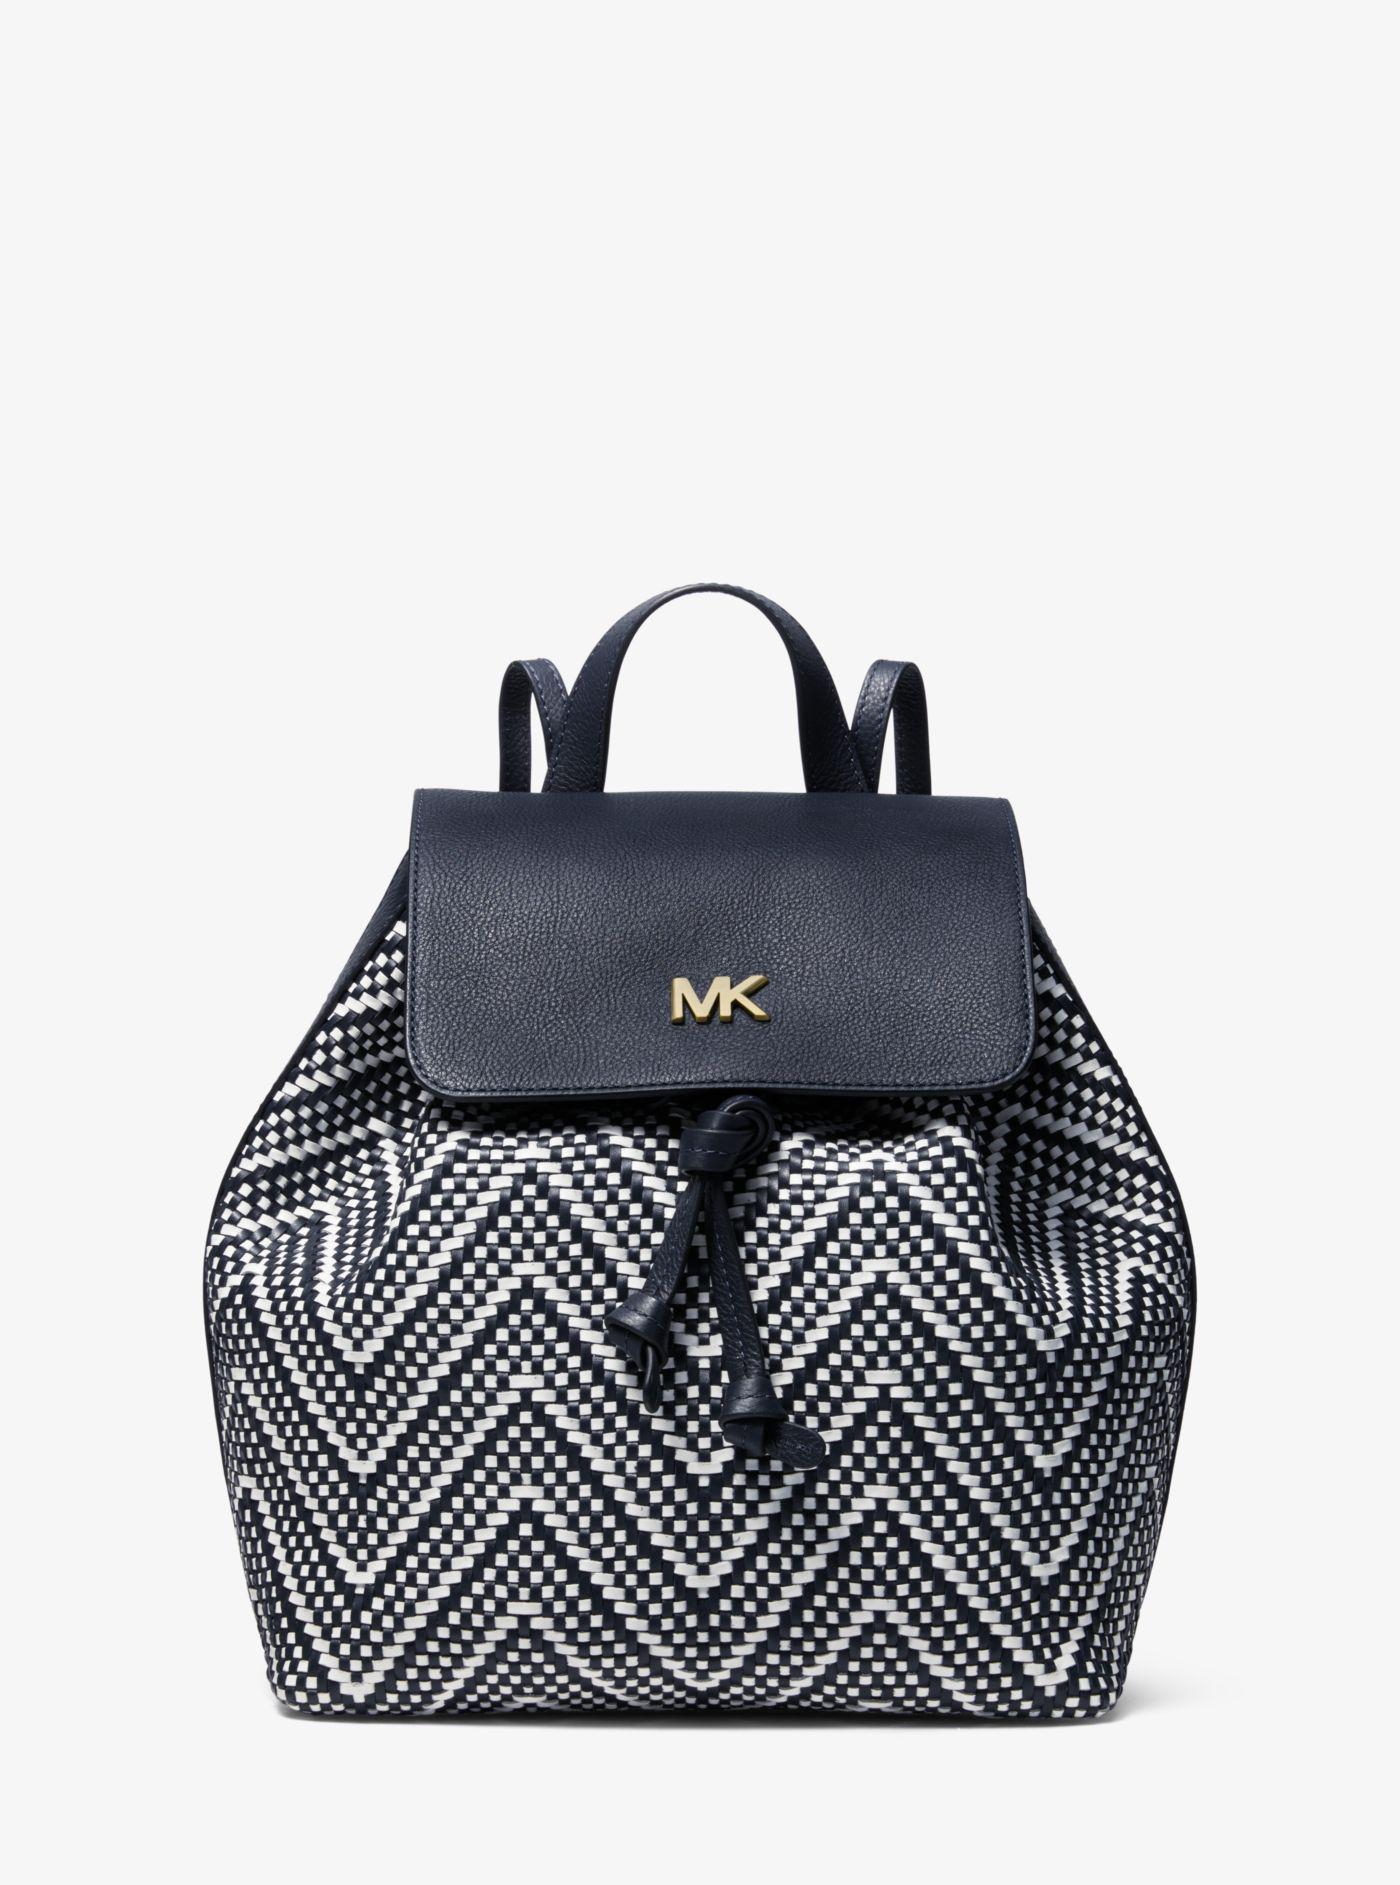 b5088479a9cb80 Michael Kors. Women's Junie Medium Woven Leather Backpack